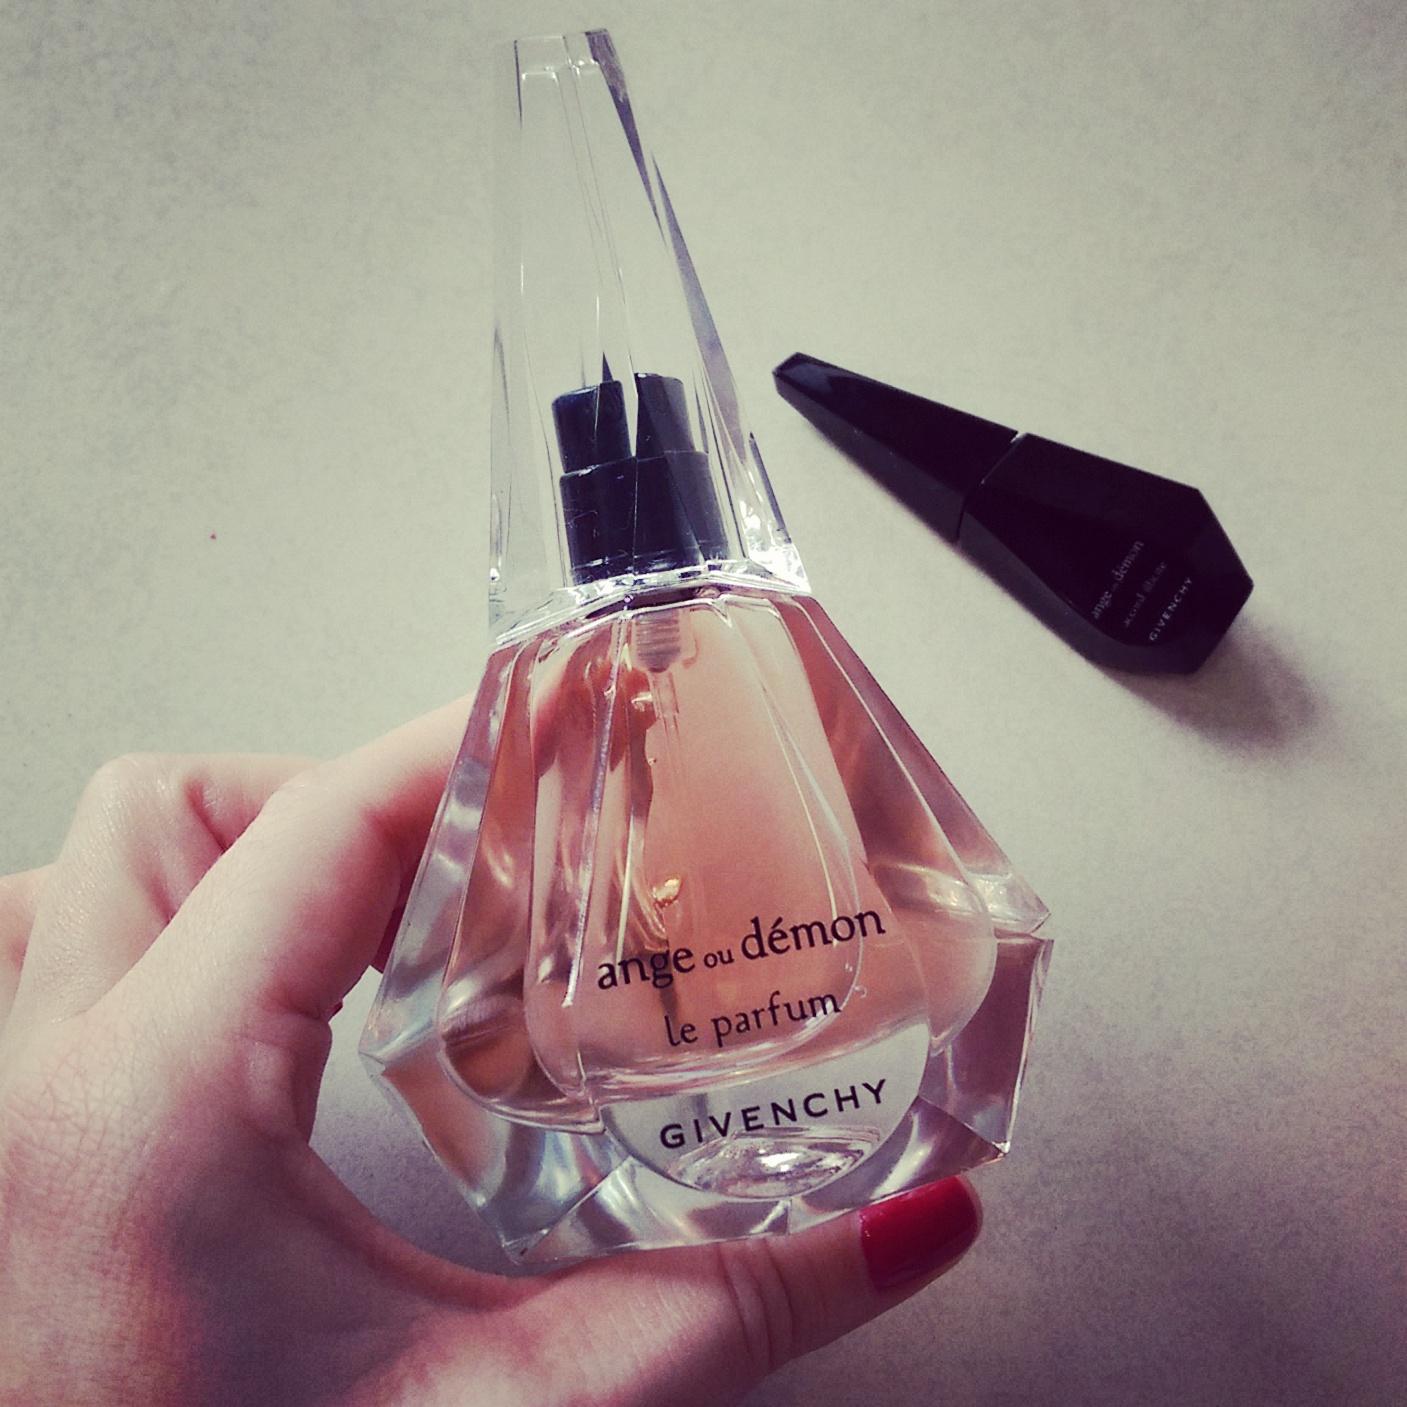 Parfum Paris Ange Ou Alaia Le Demon Review Givenchy Perfumes New v6aOwSW